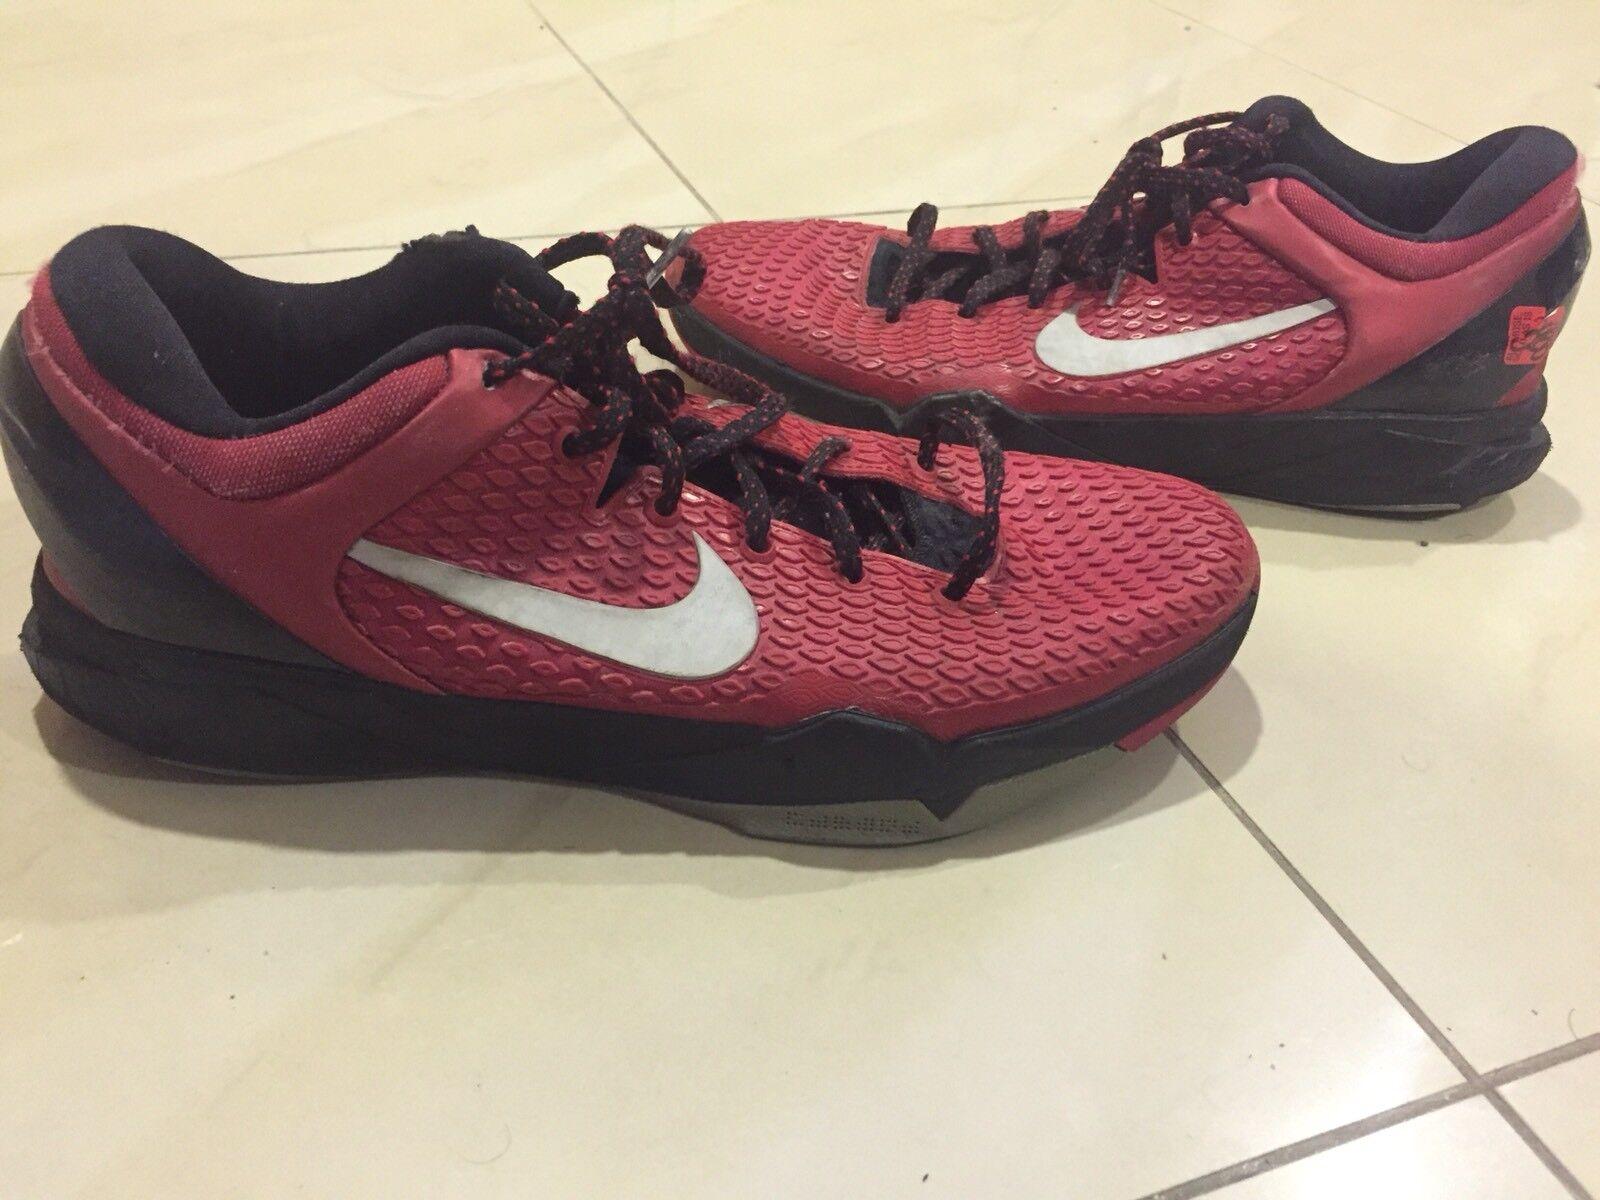 NIKE Zoom Kobe VII System TB Gym Red Black Mamba Elite Textured 7 Size 13